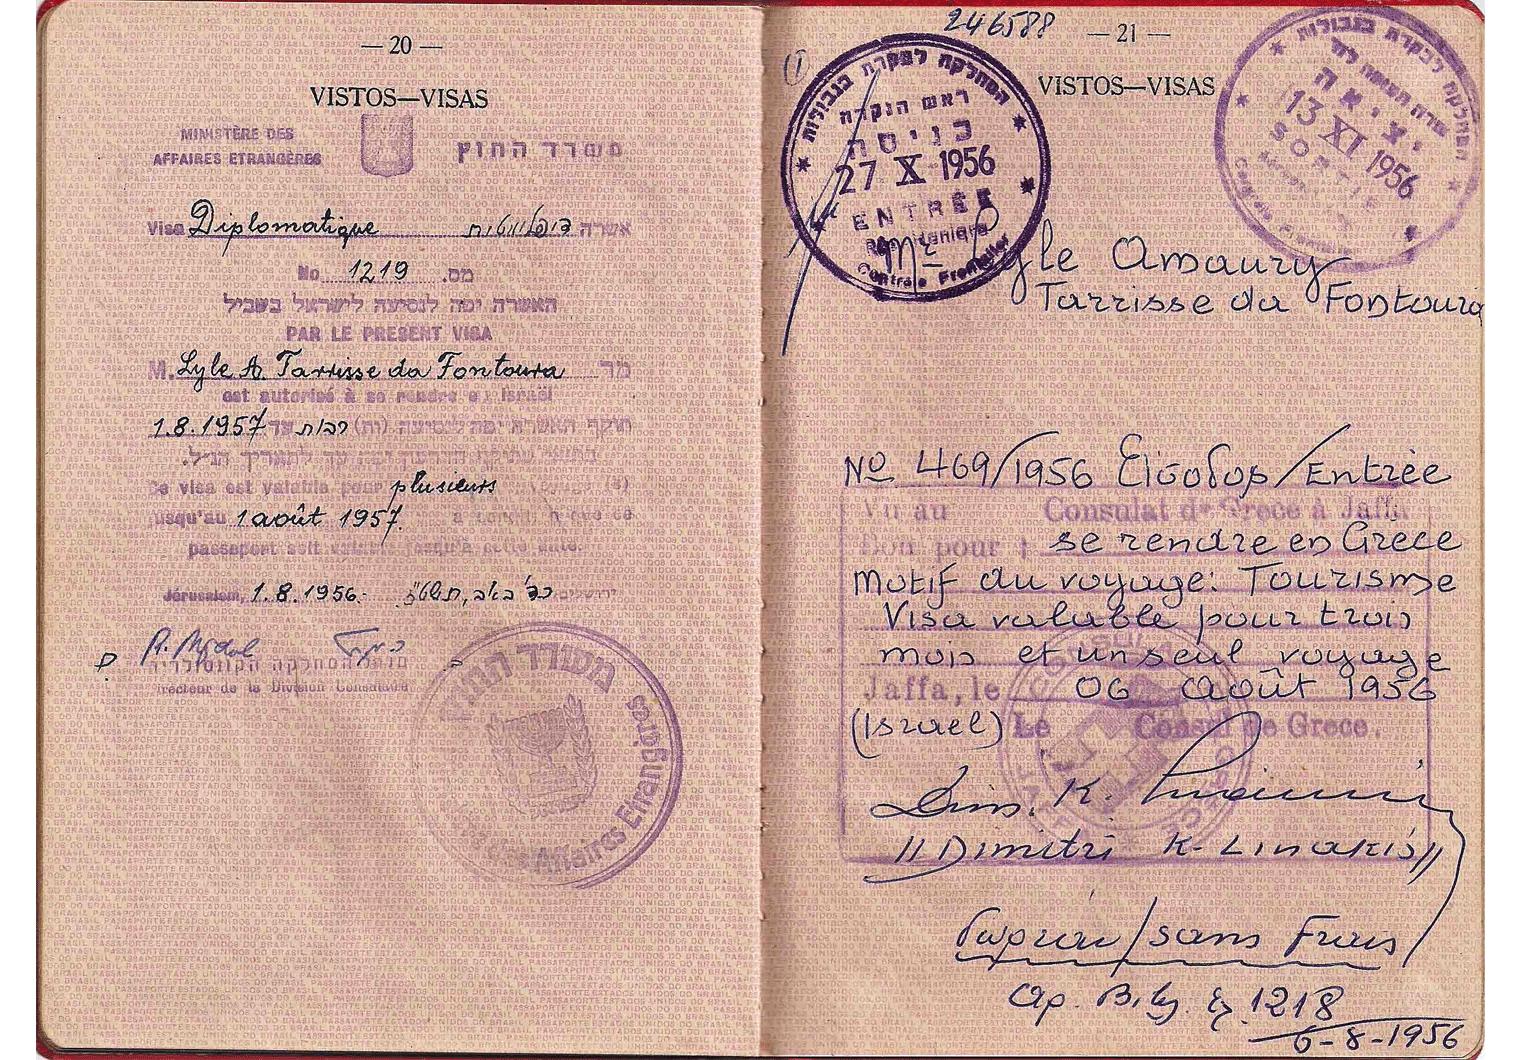 Superb 1954 diplomatic passports